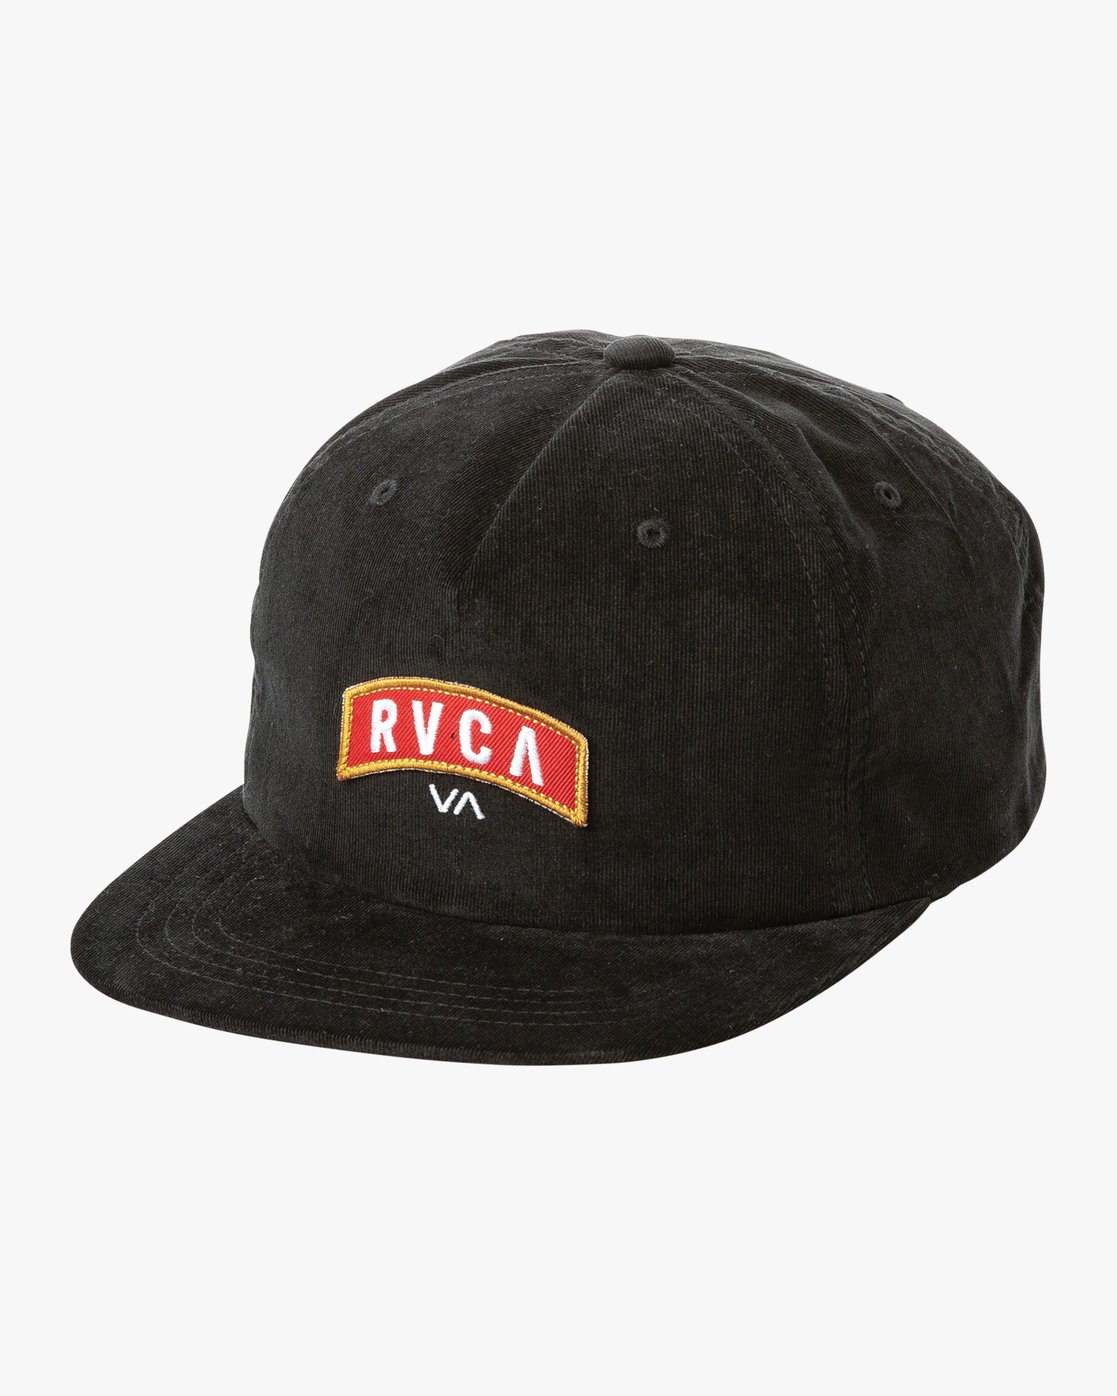 1e72153f1b10a5 0 Everett Snapback Hat Black MAHWTREV RVCA